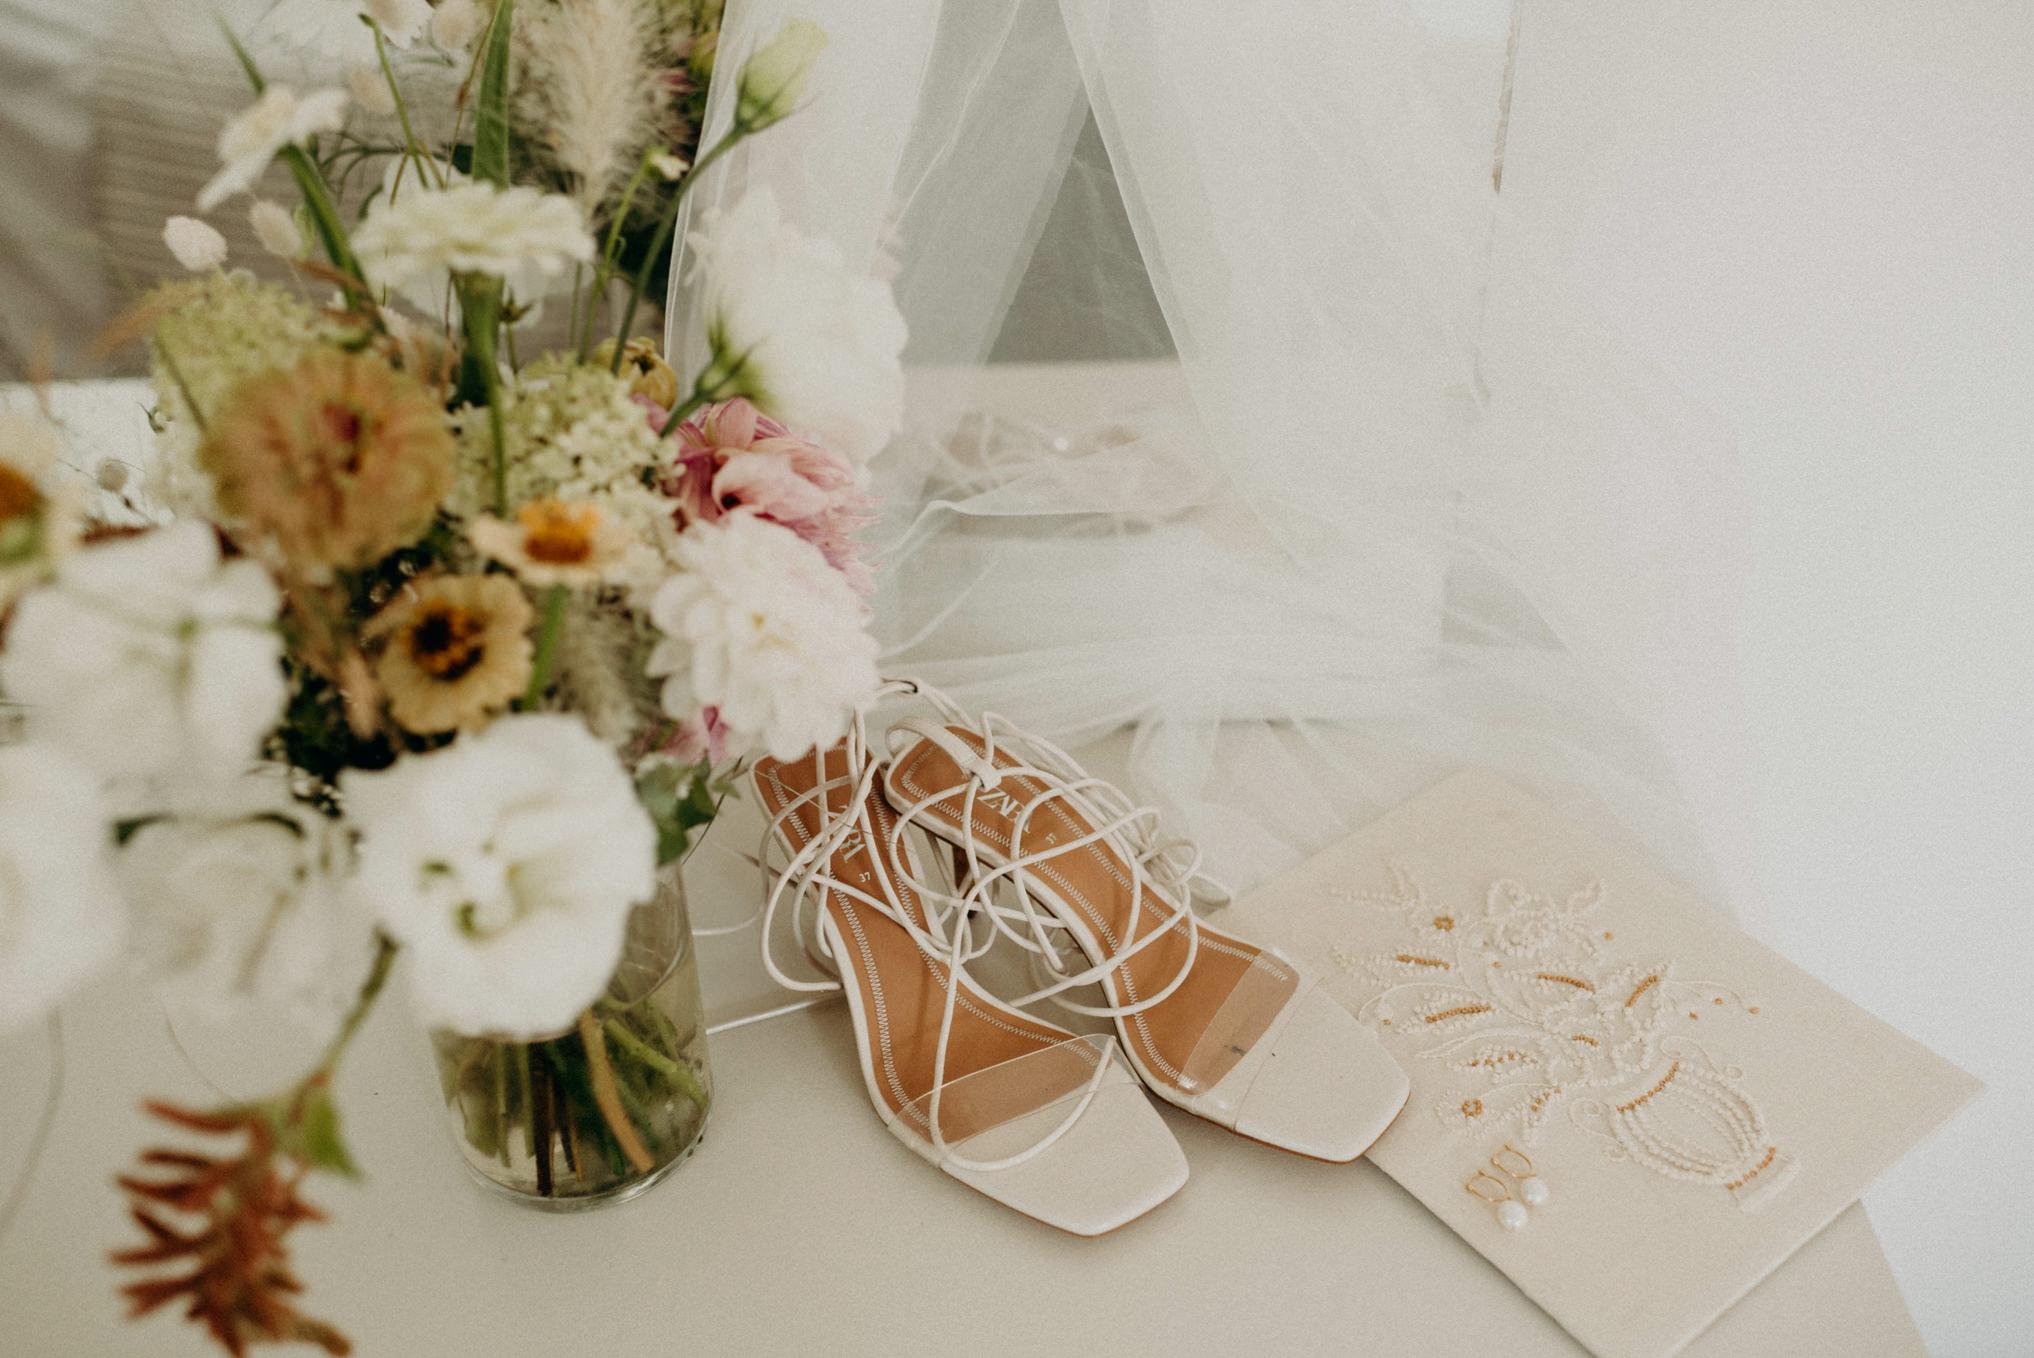 wedding shoes on white dresser